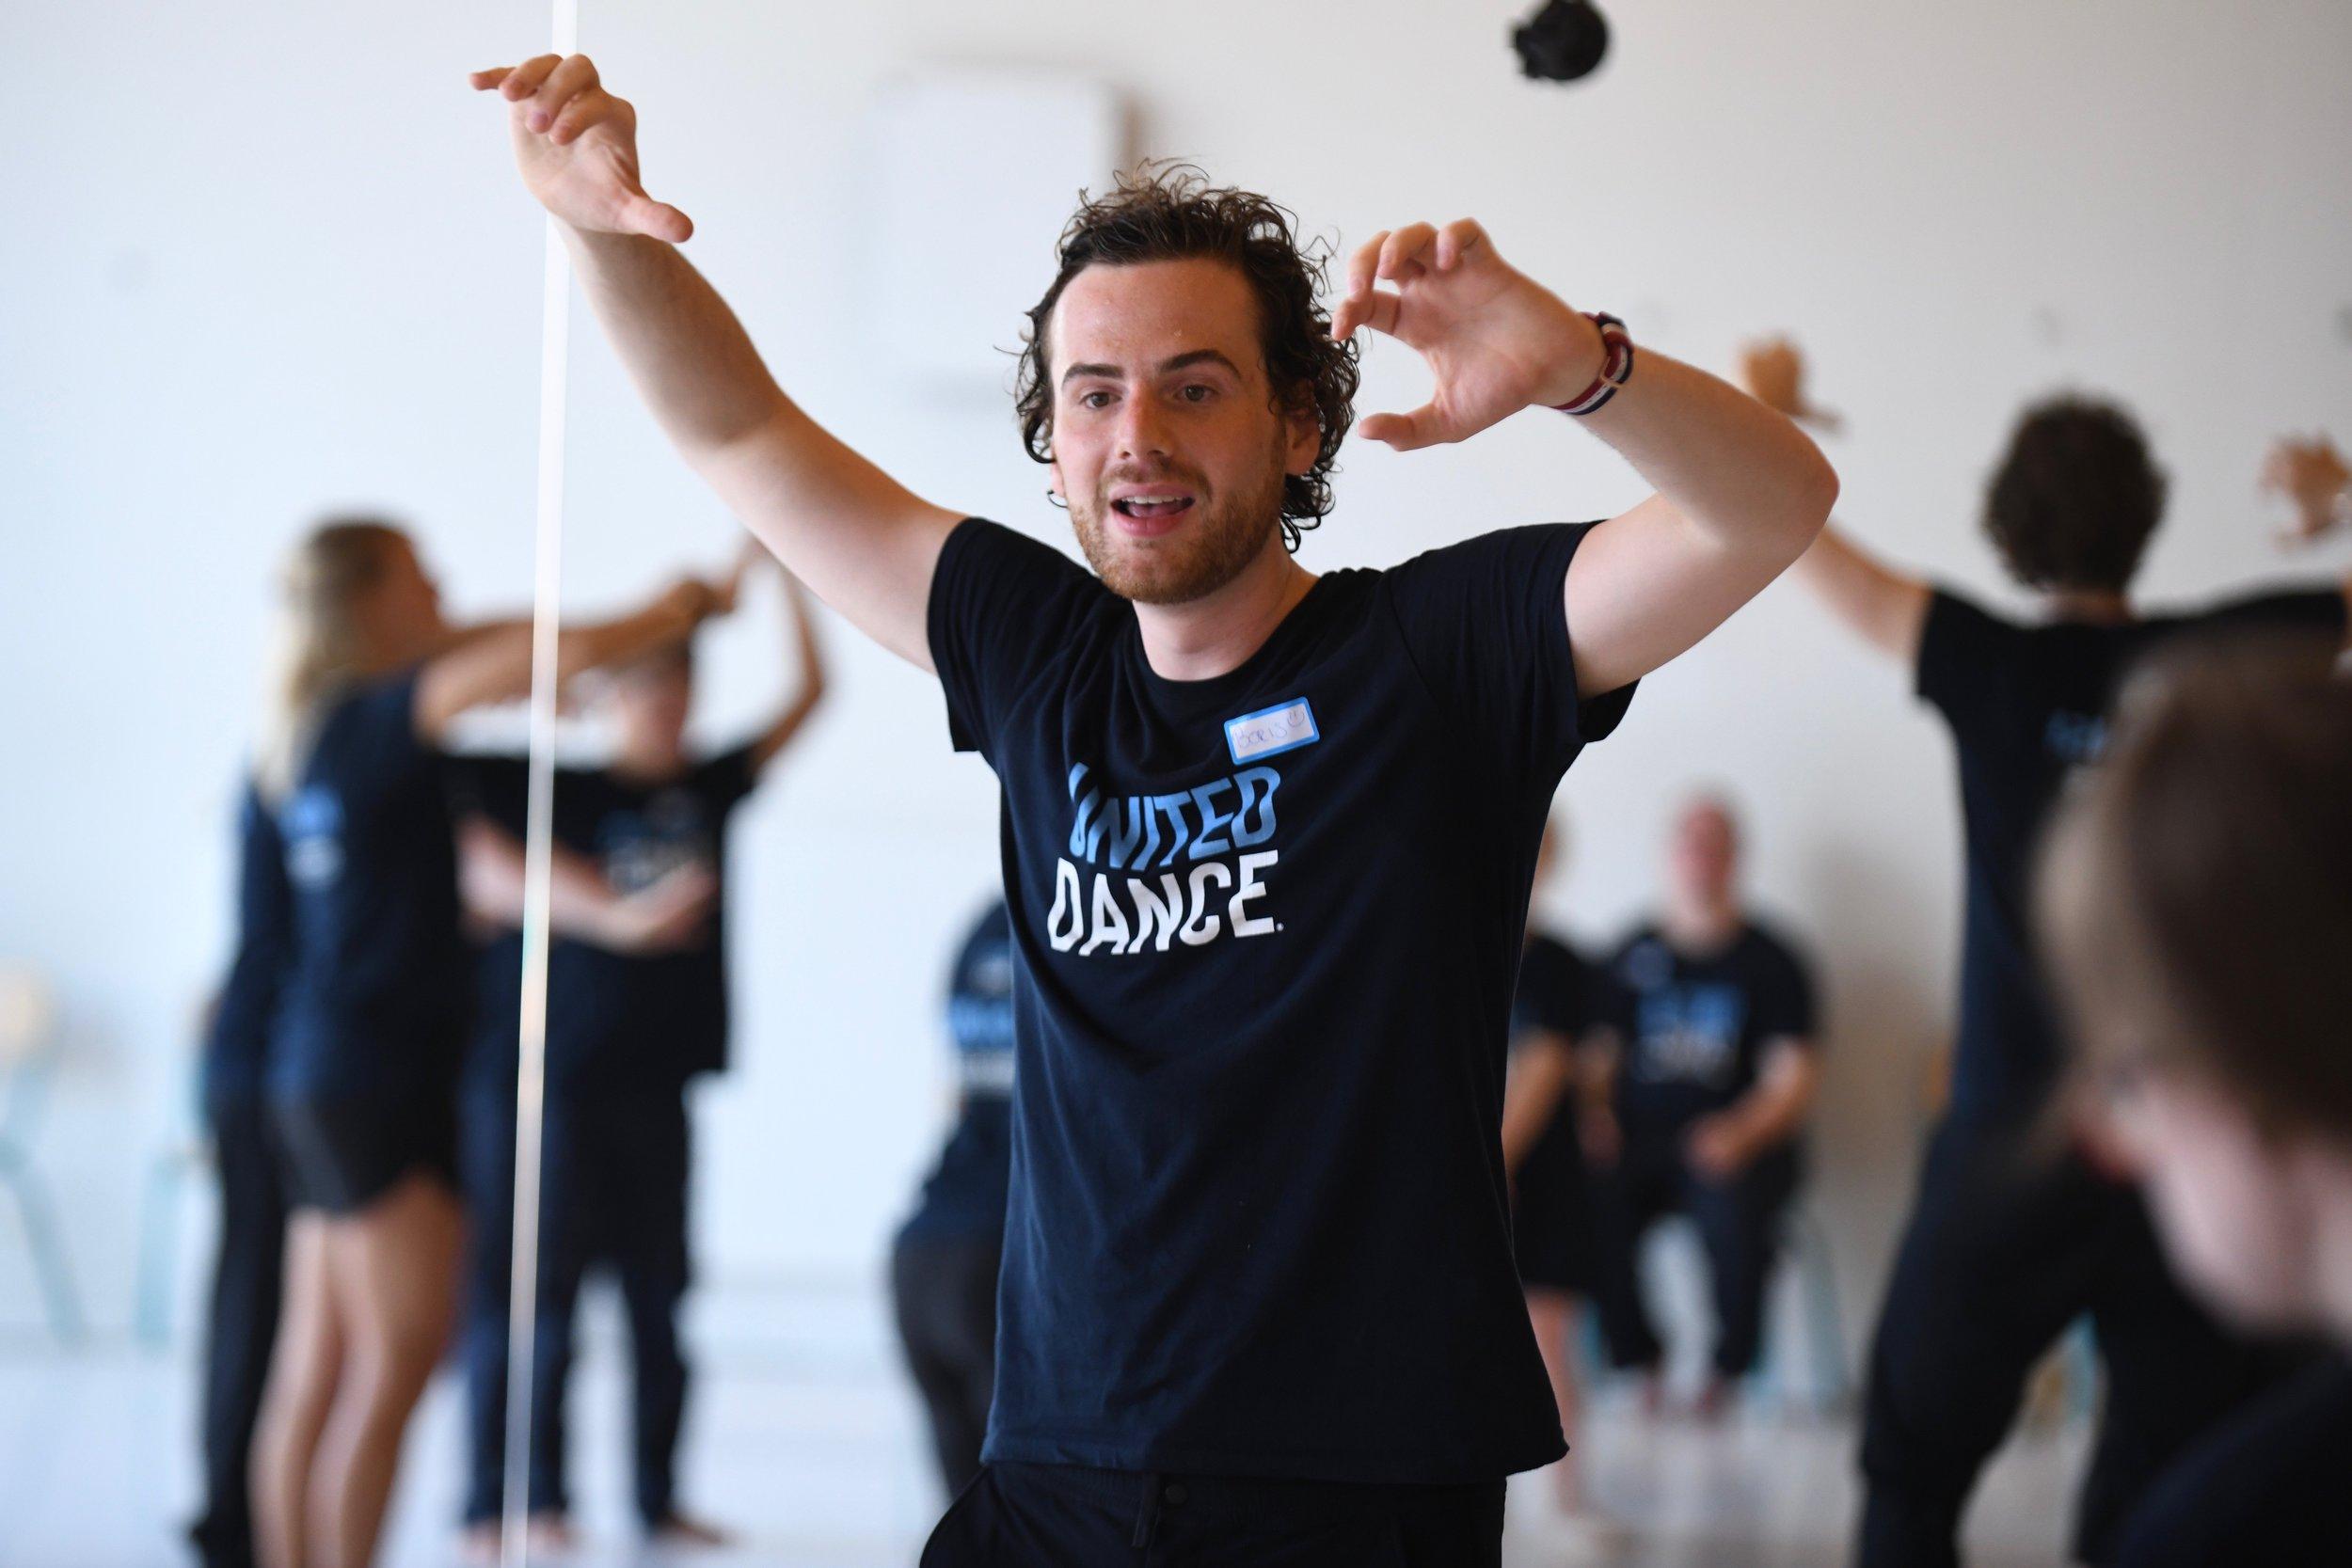 United Dance Teacher Boris Richir